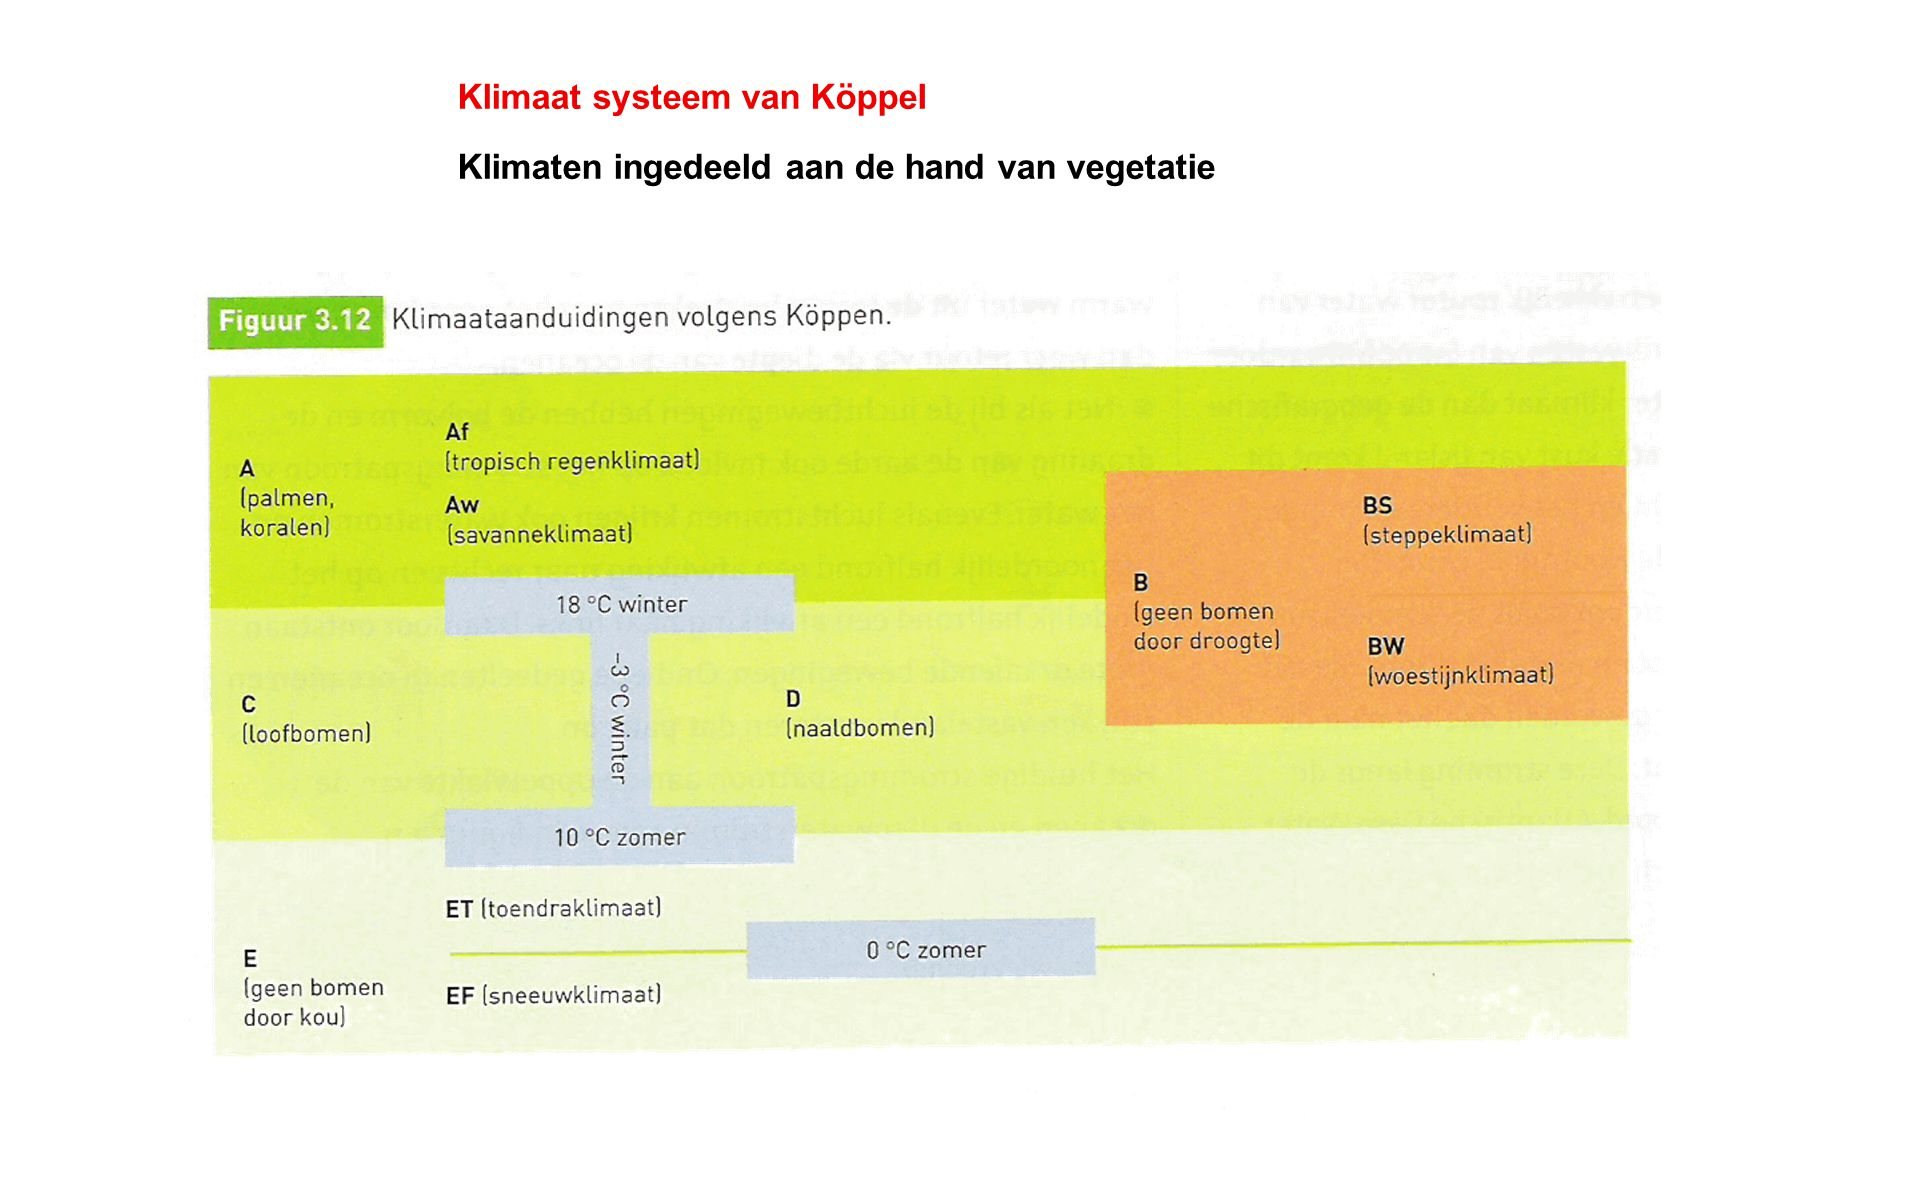 Klimaat systeem van KöppeI